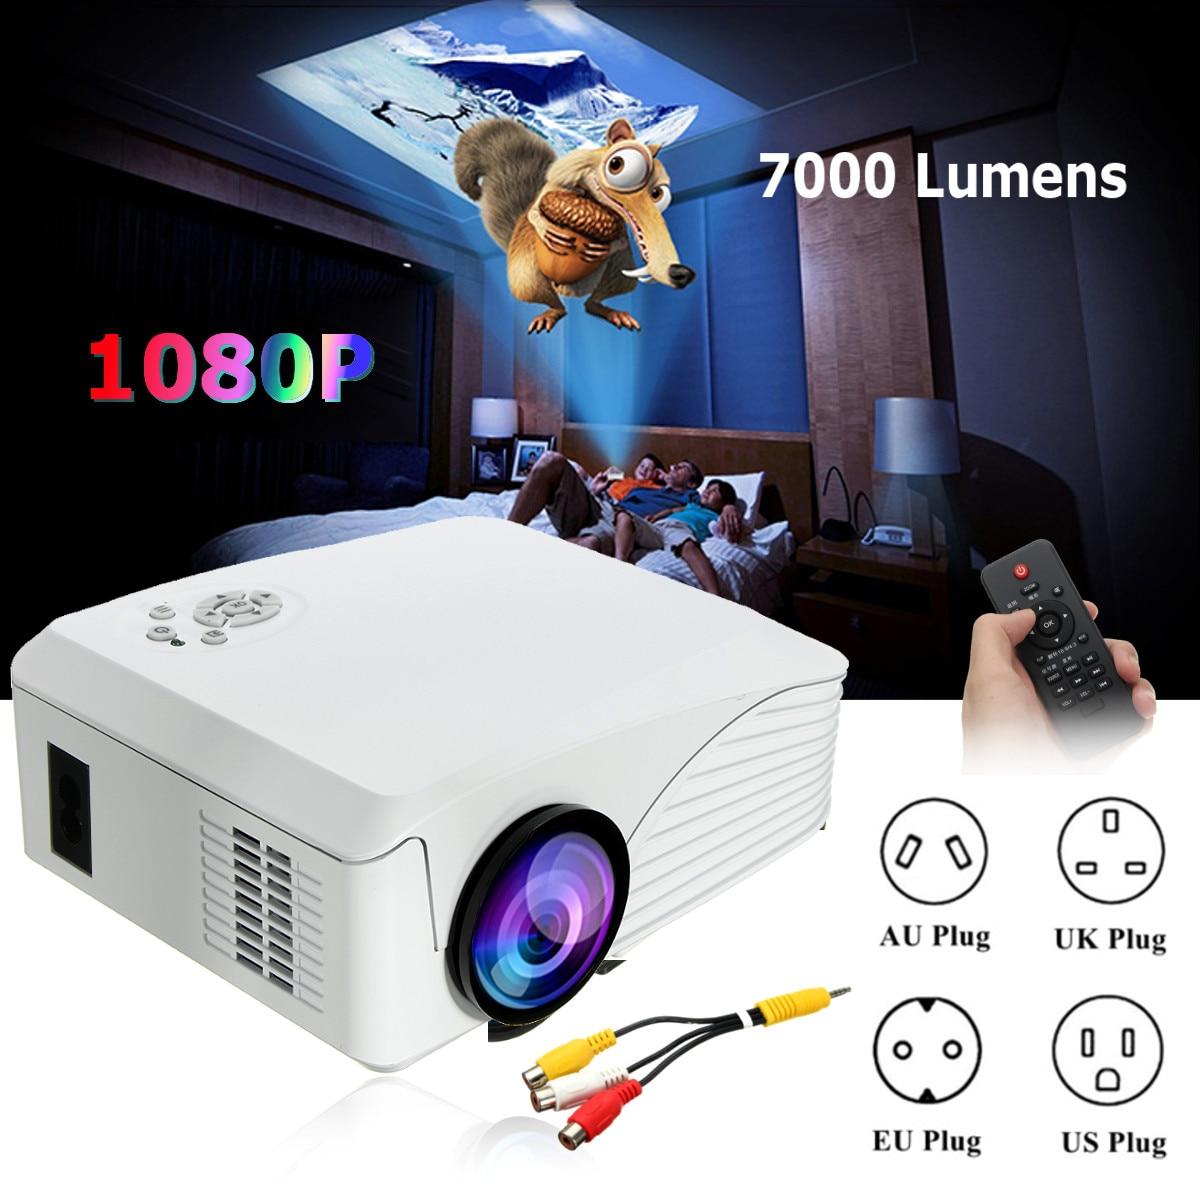 Portable 7000 Lumens HD 1080P 3D Multimedia Projector LED Home Theater HDMI USBPortable 7000 Lumens HD 1080P 3D Multimedia Projector LED Home Theater HDMI USB